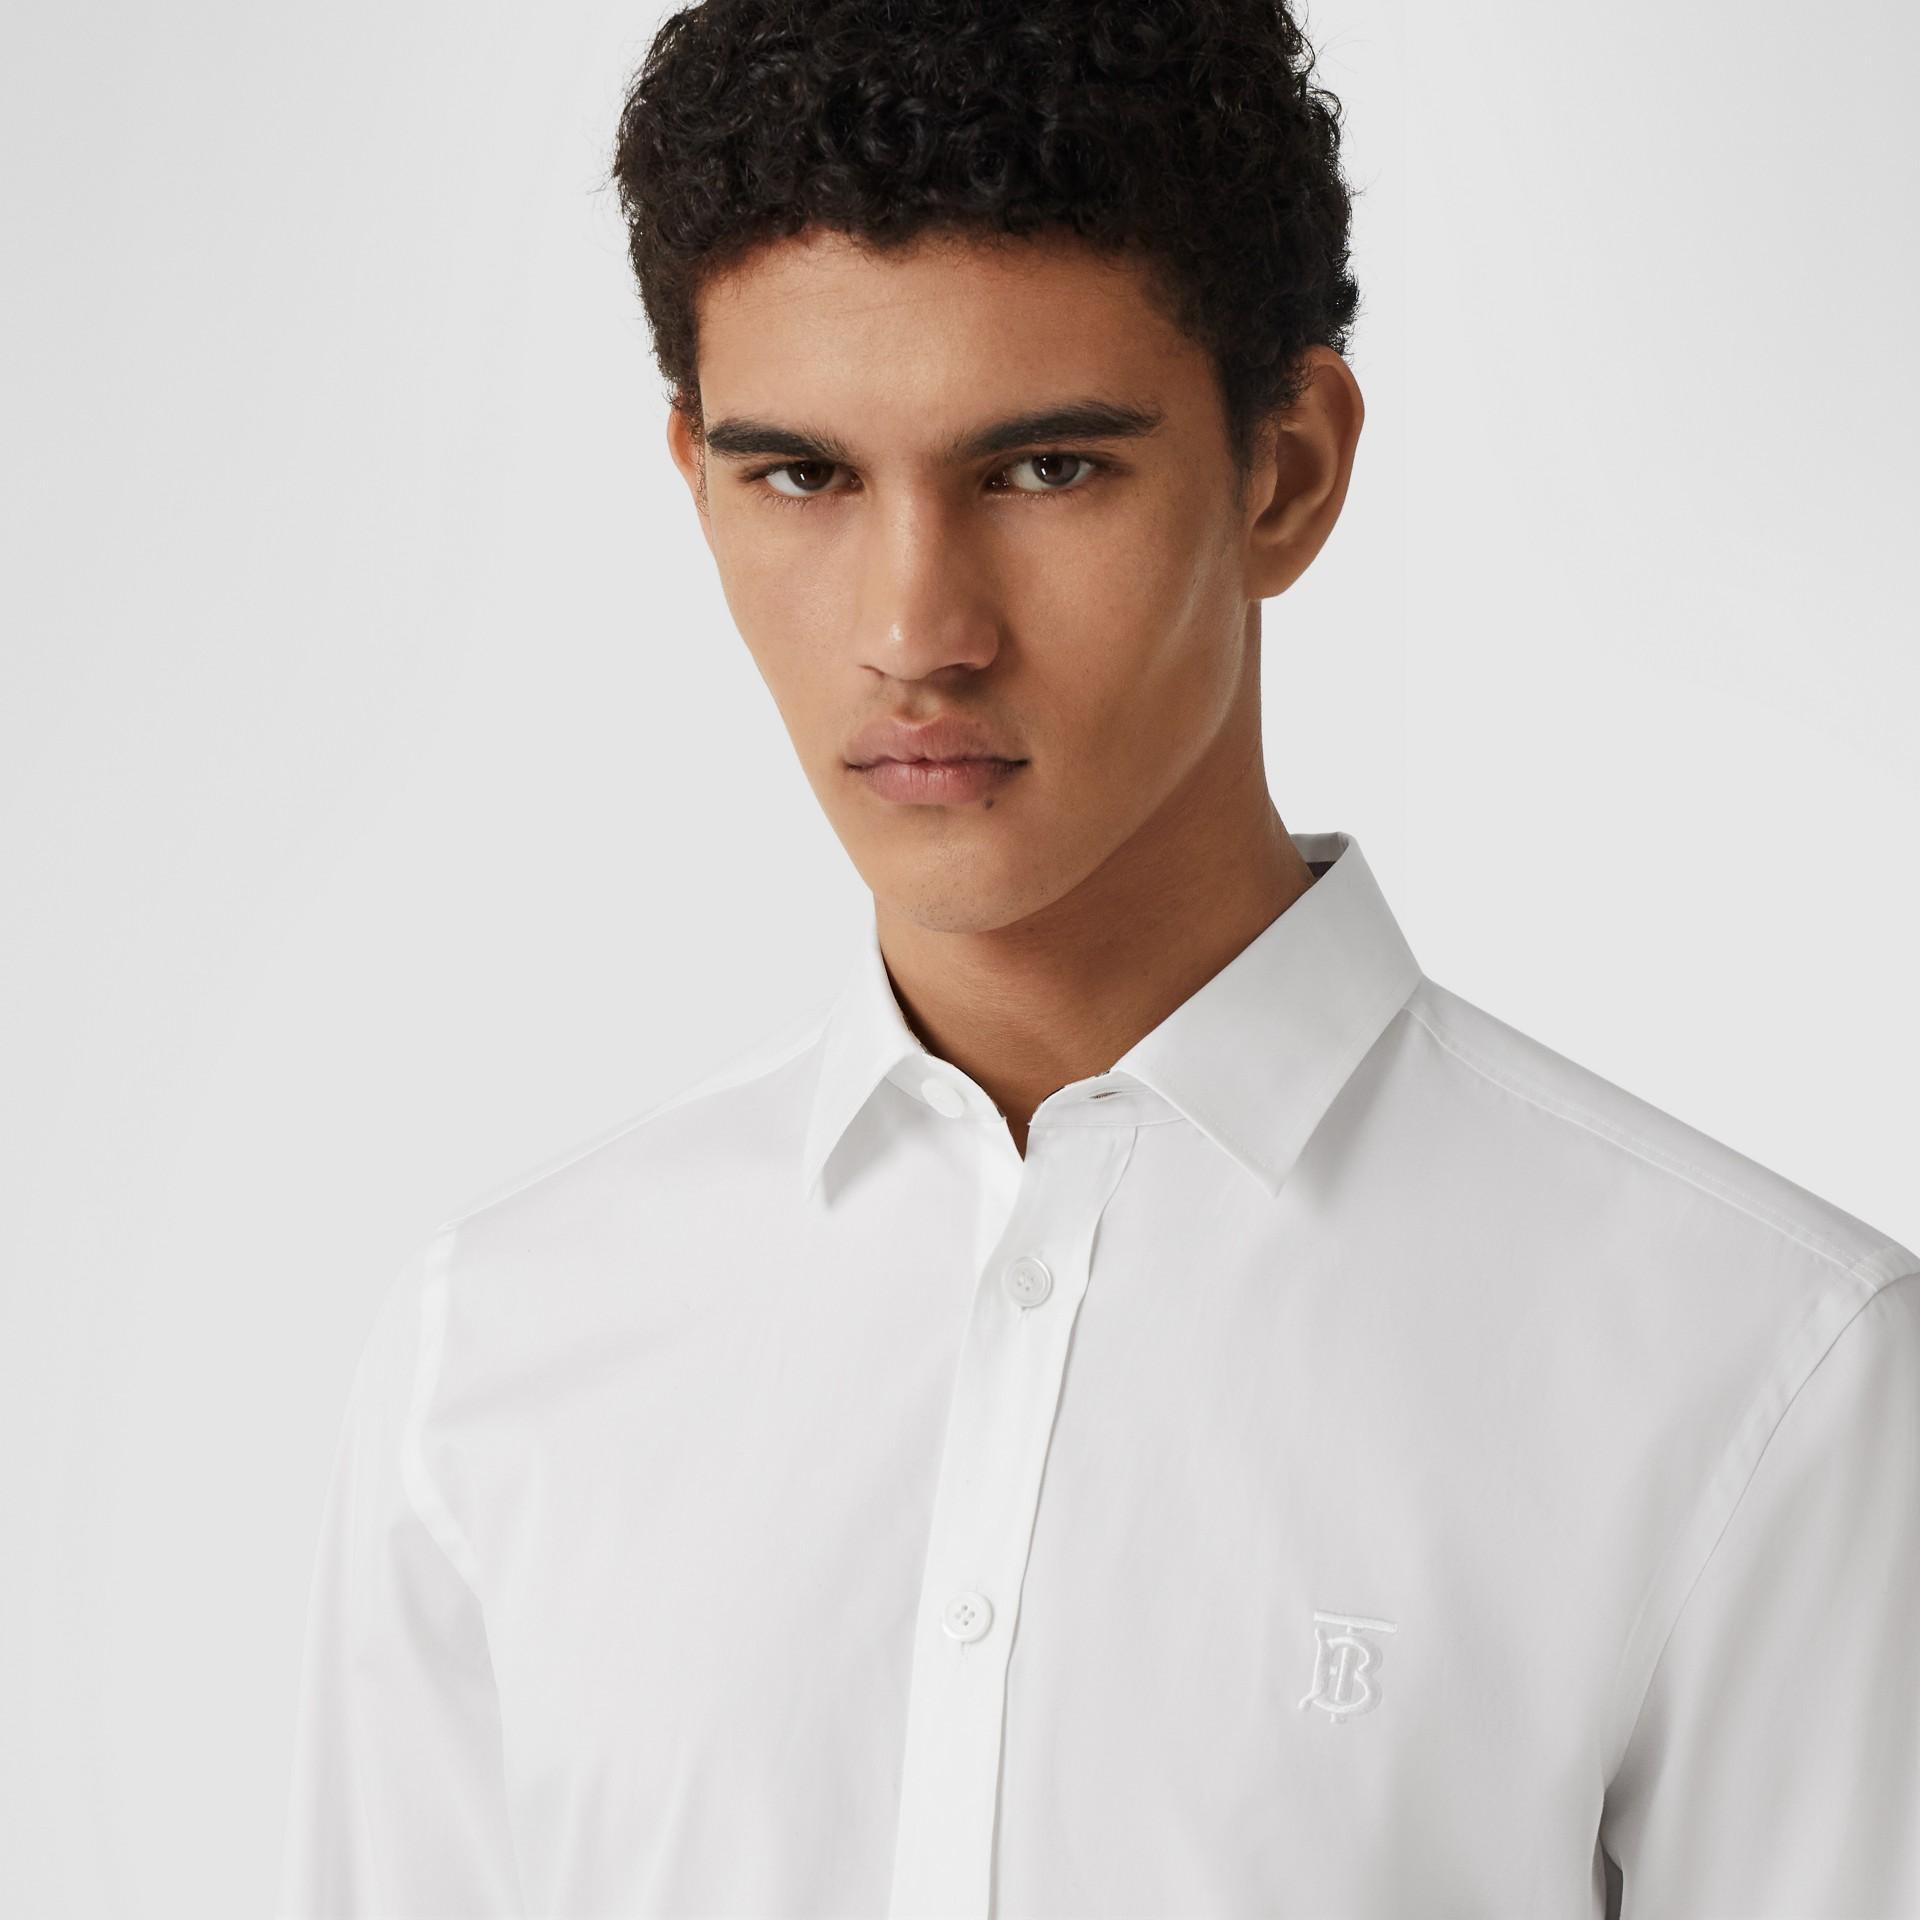 Slim Fit Monogram Motif Stretch Cotton Poplin Shirt in White - Men | Burberry United States - gallery image 4